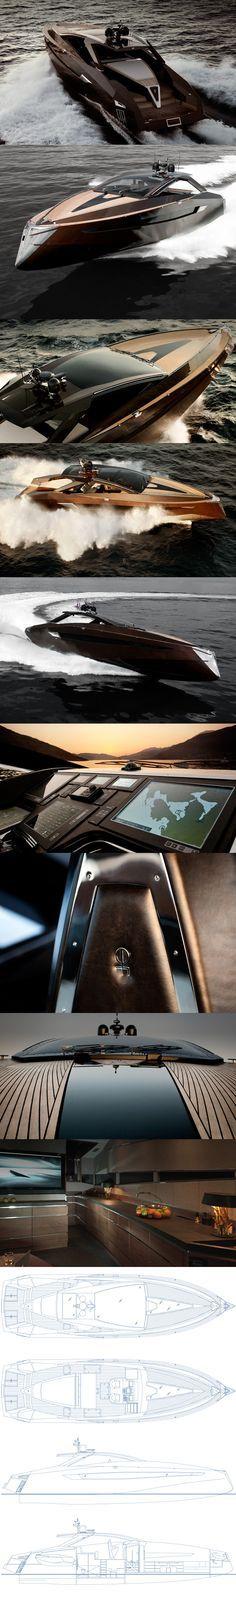 Art of Kinetik Hedonist #Yacht #luxury More pins under www.supondo.com